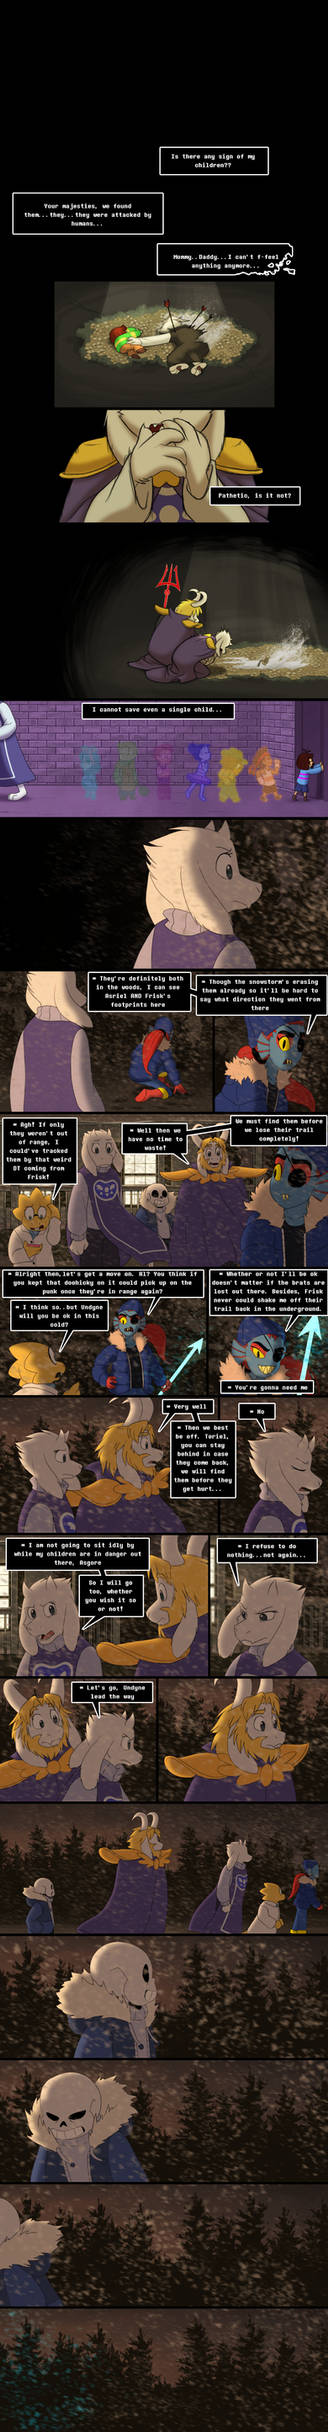 Endertale - Page 41